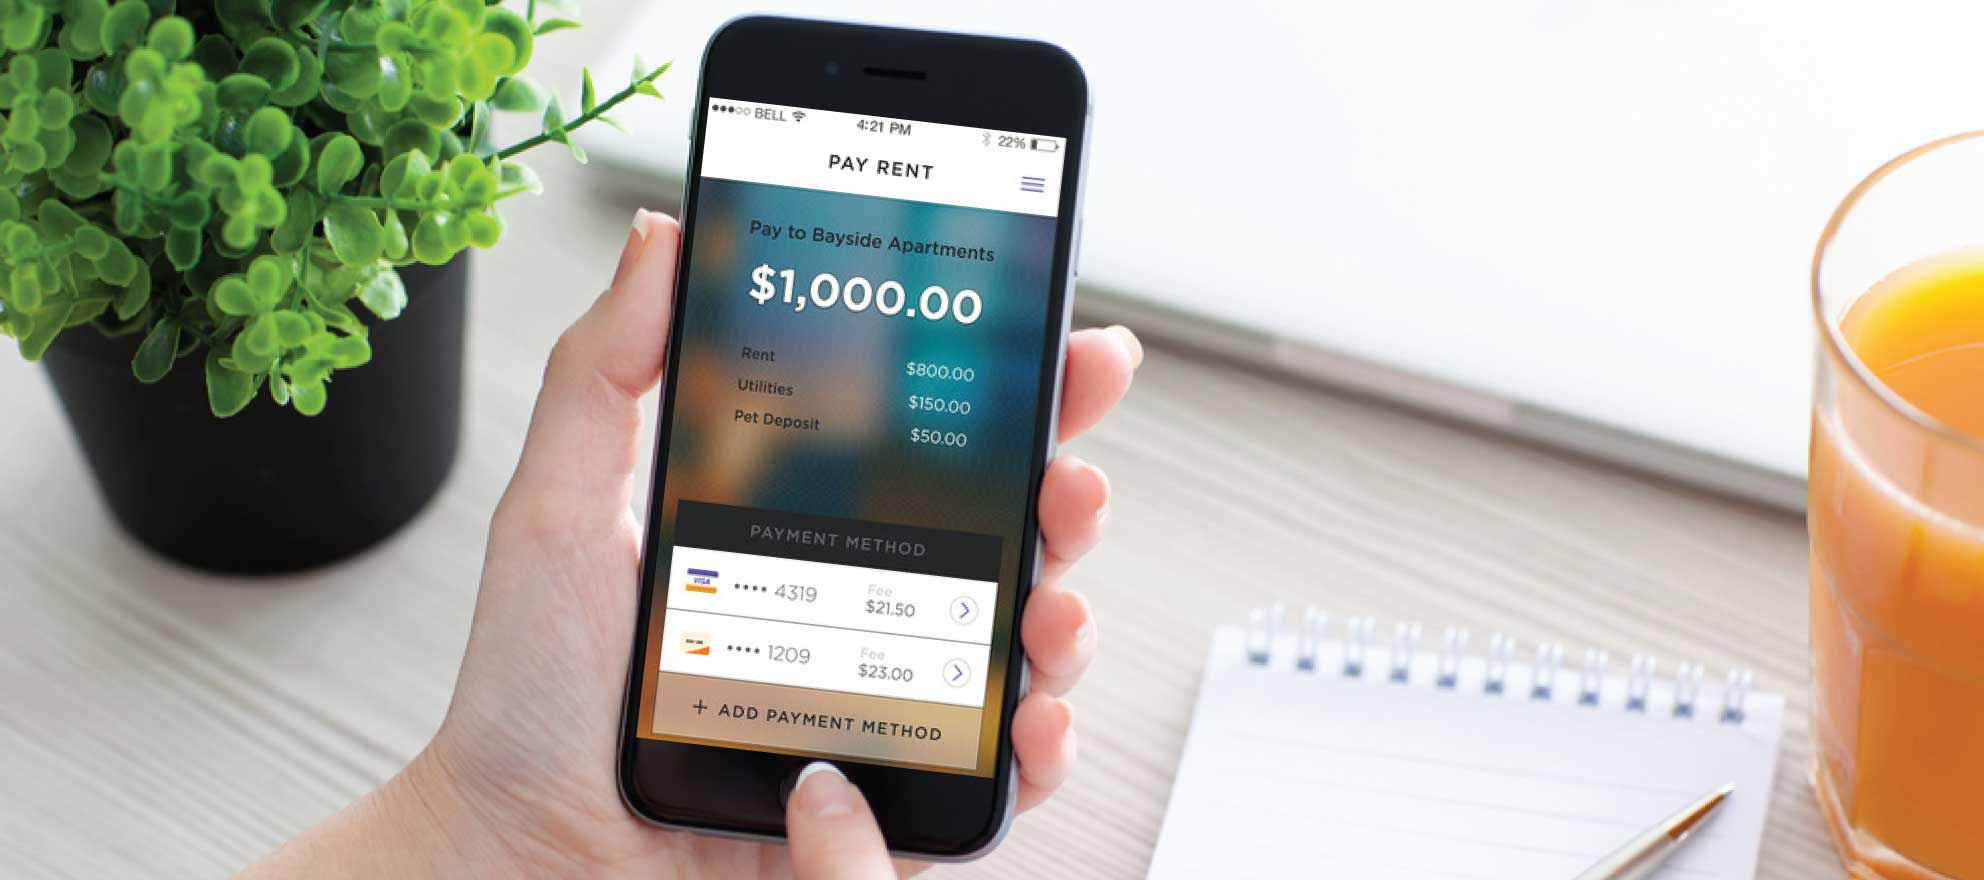 RentPayment boosts tenant credit score through TransUnion -- and landlords reap benefits